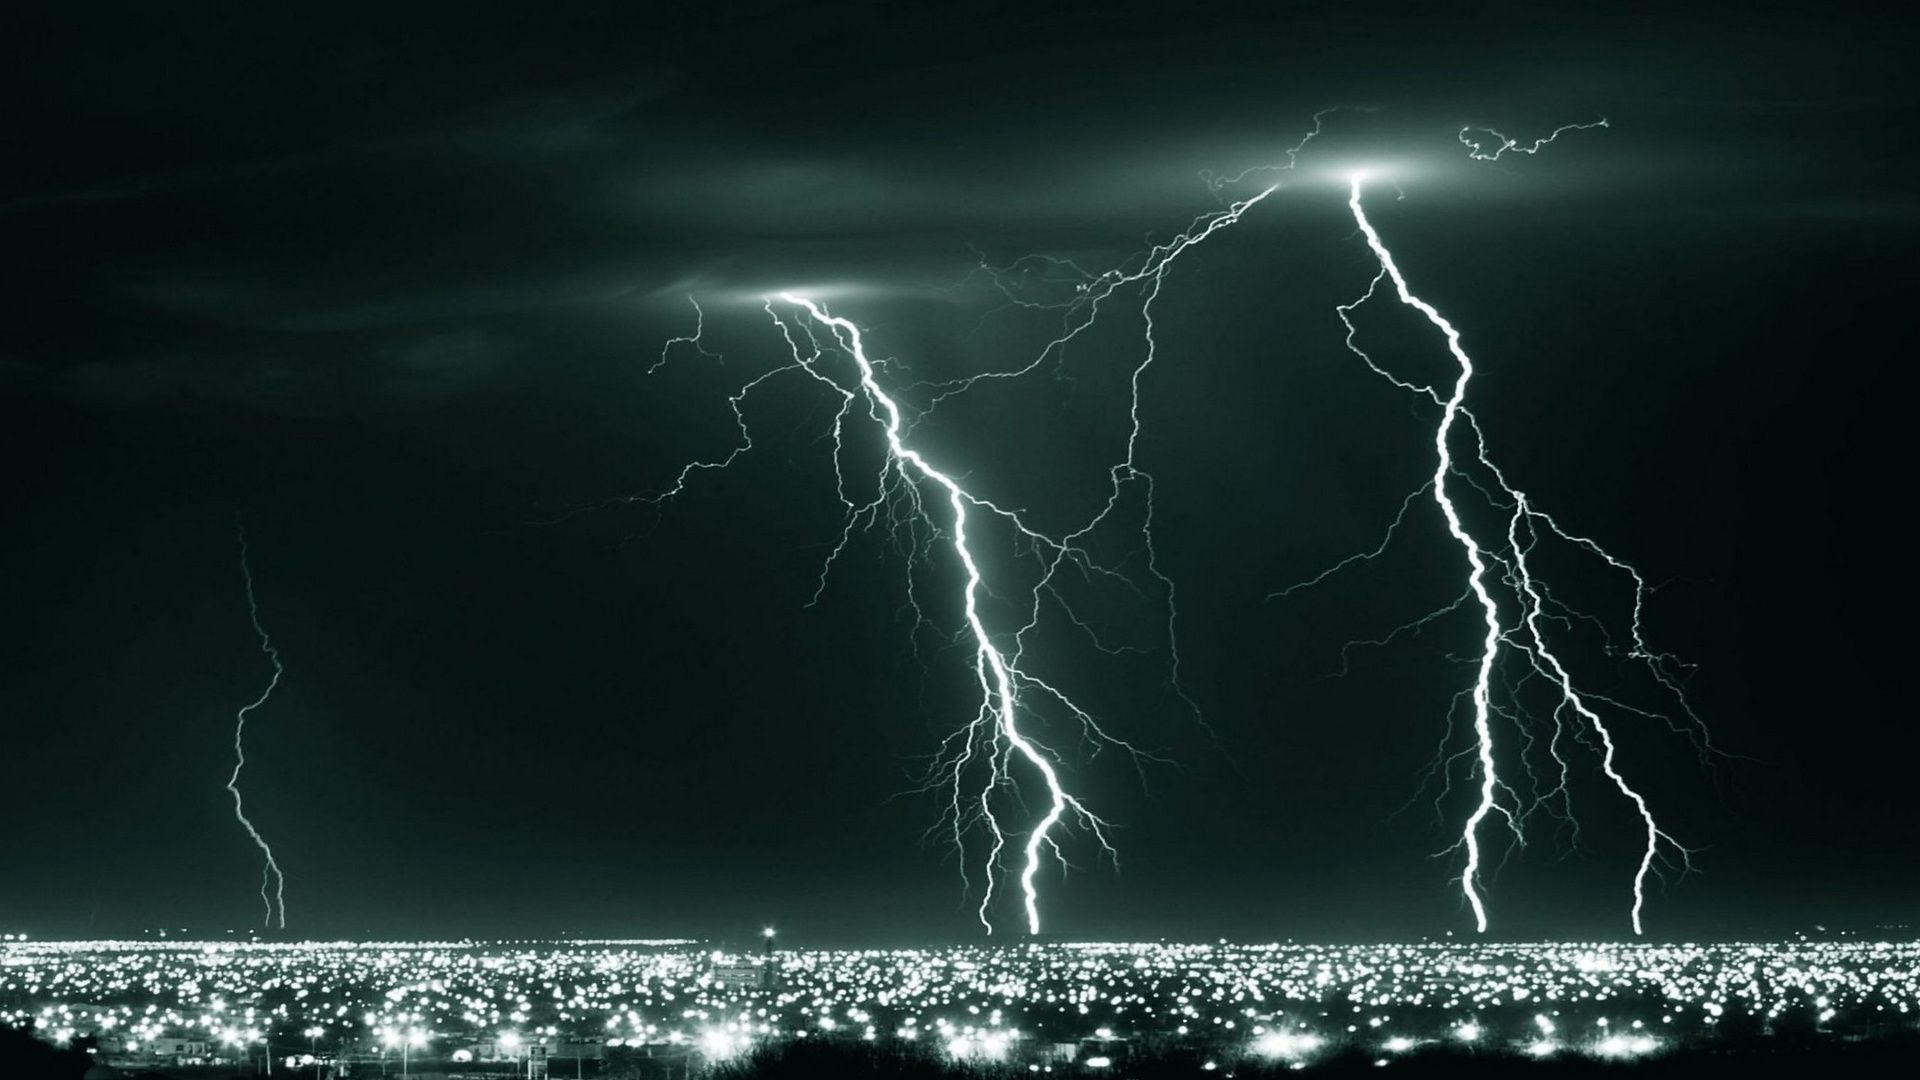 Lightning Bolt wallpaper download